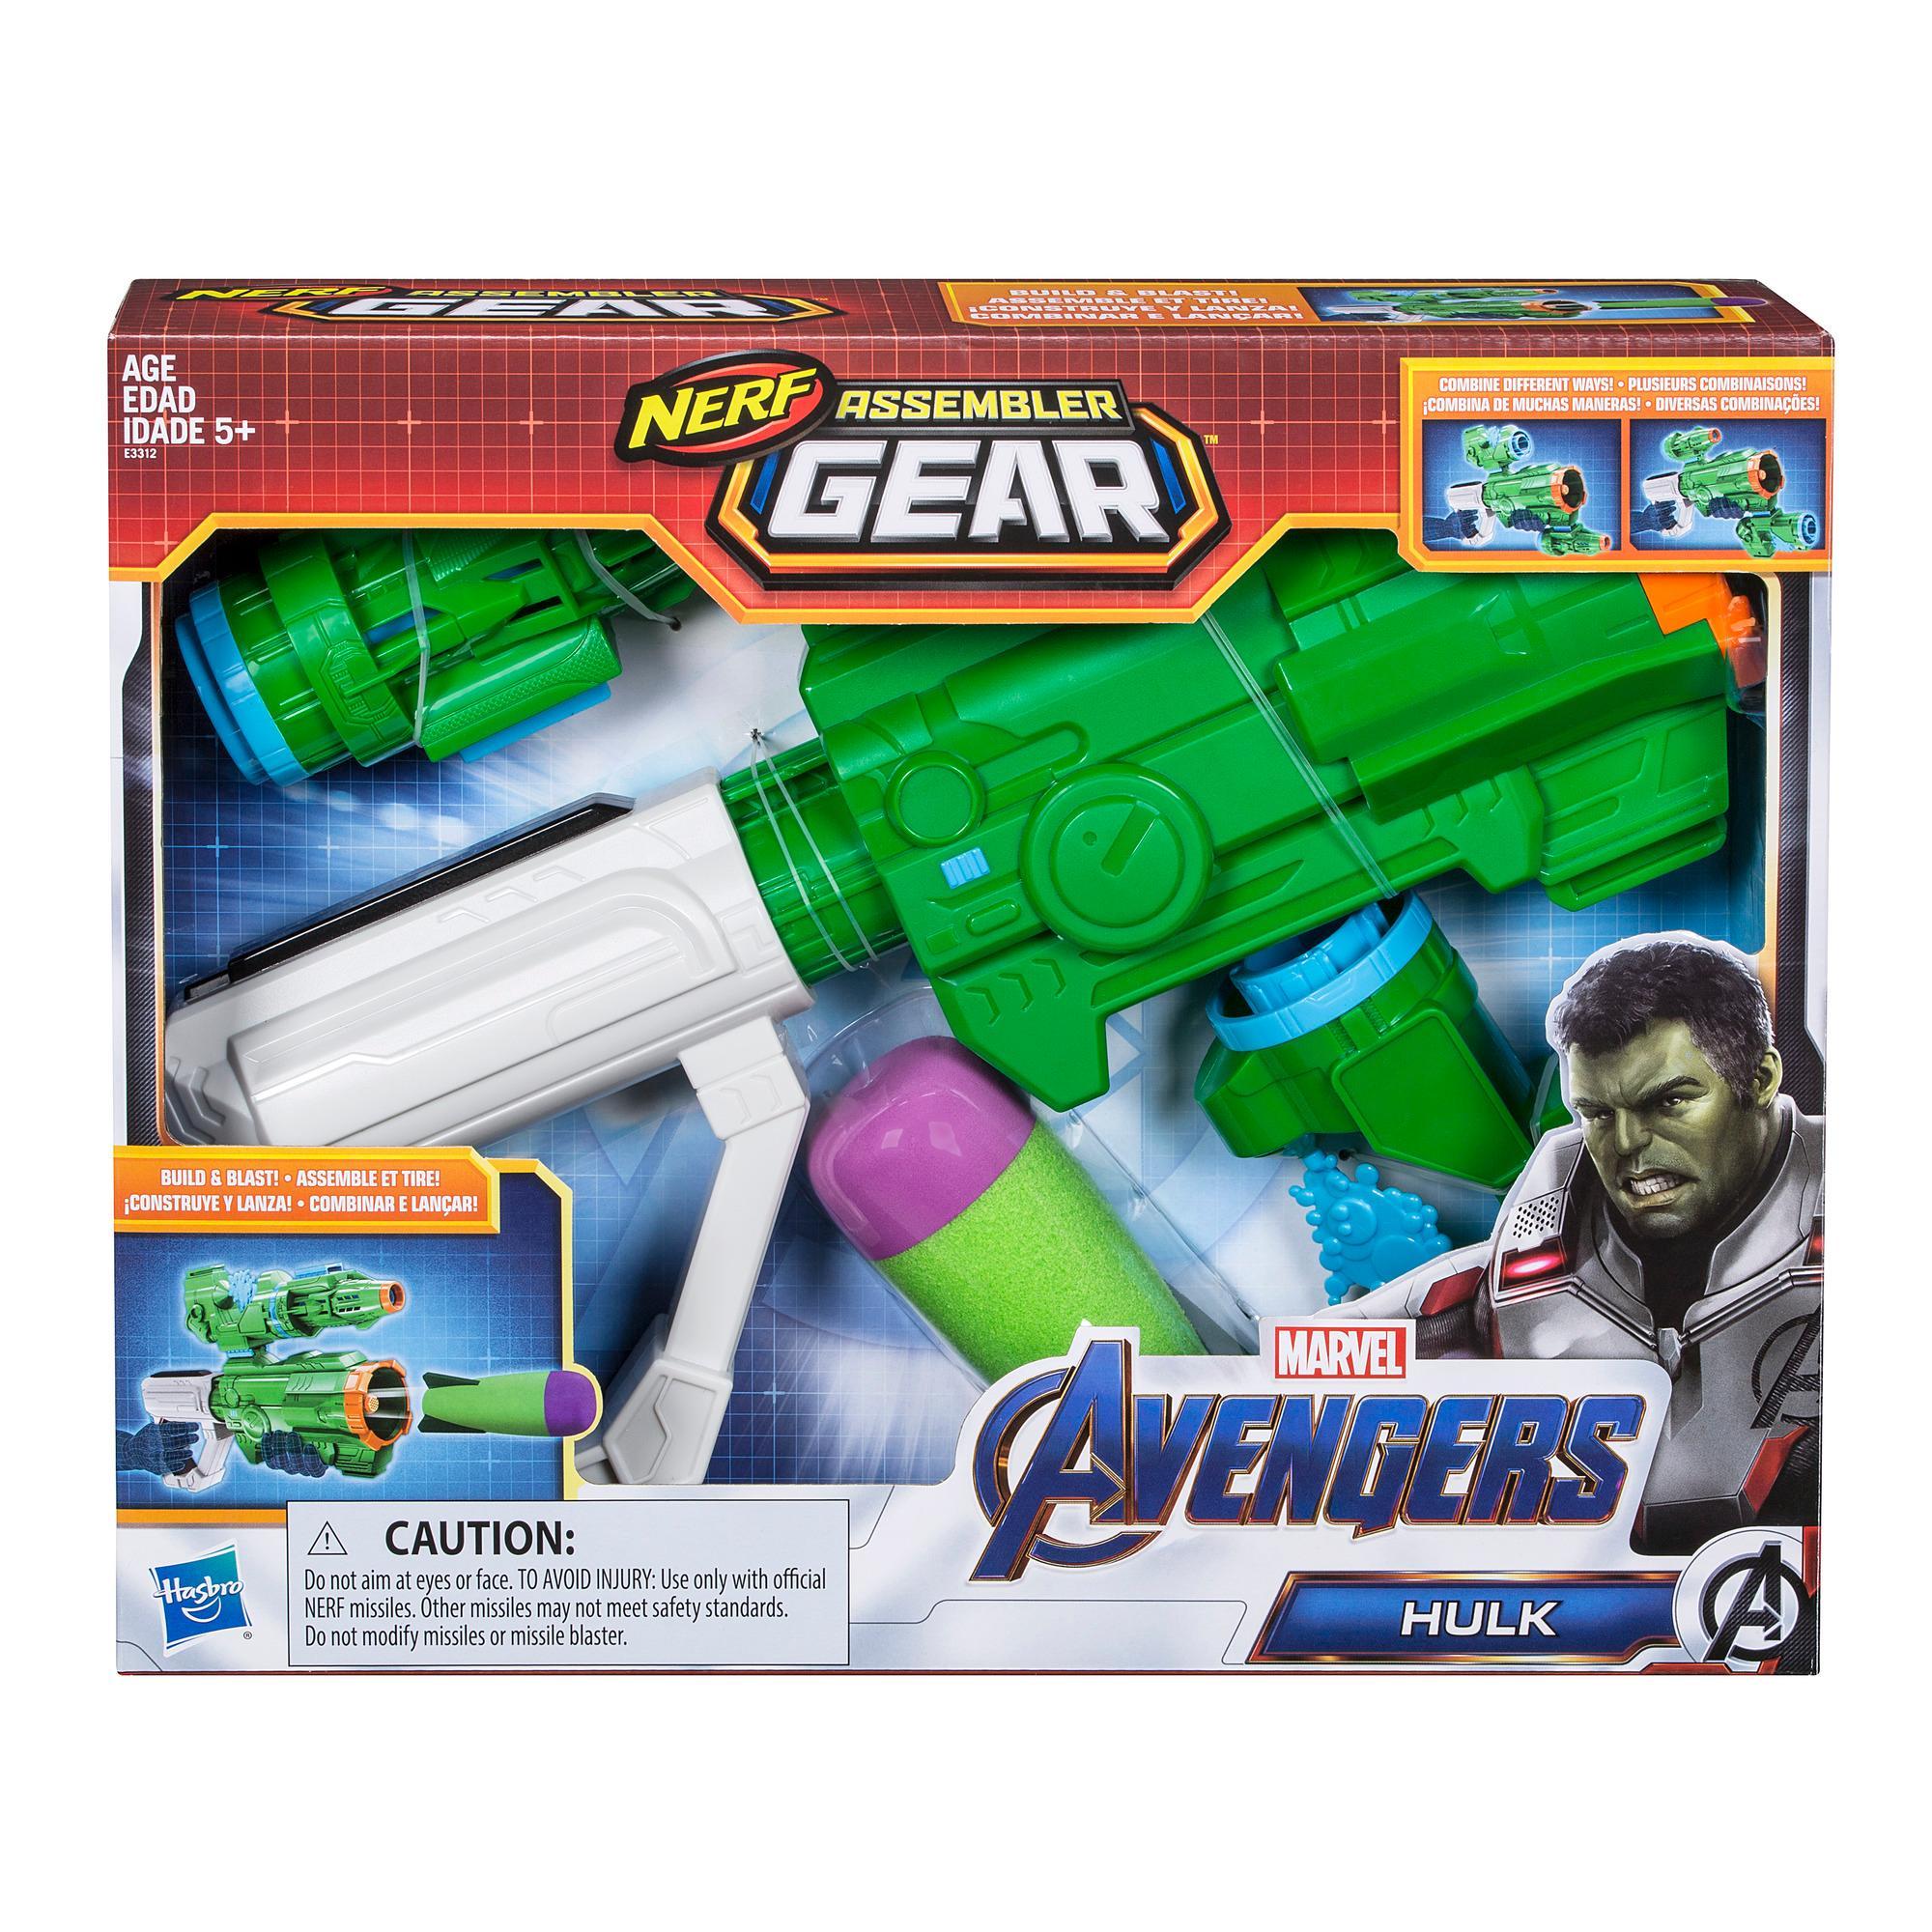 Marvel Avengers (sin título): Nerf Hulk - Assembler Gear